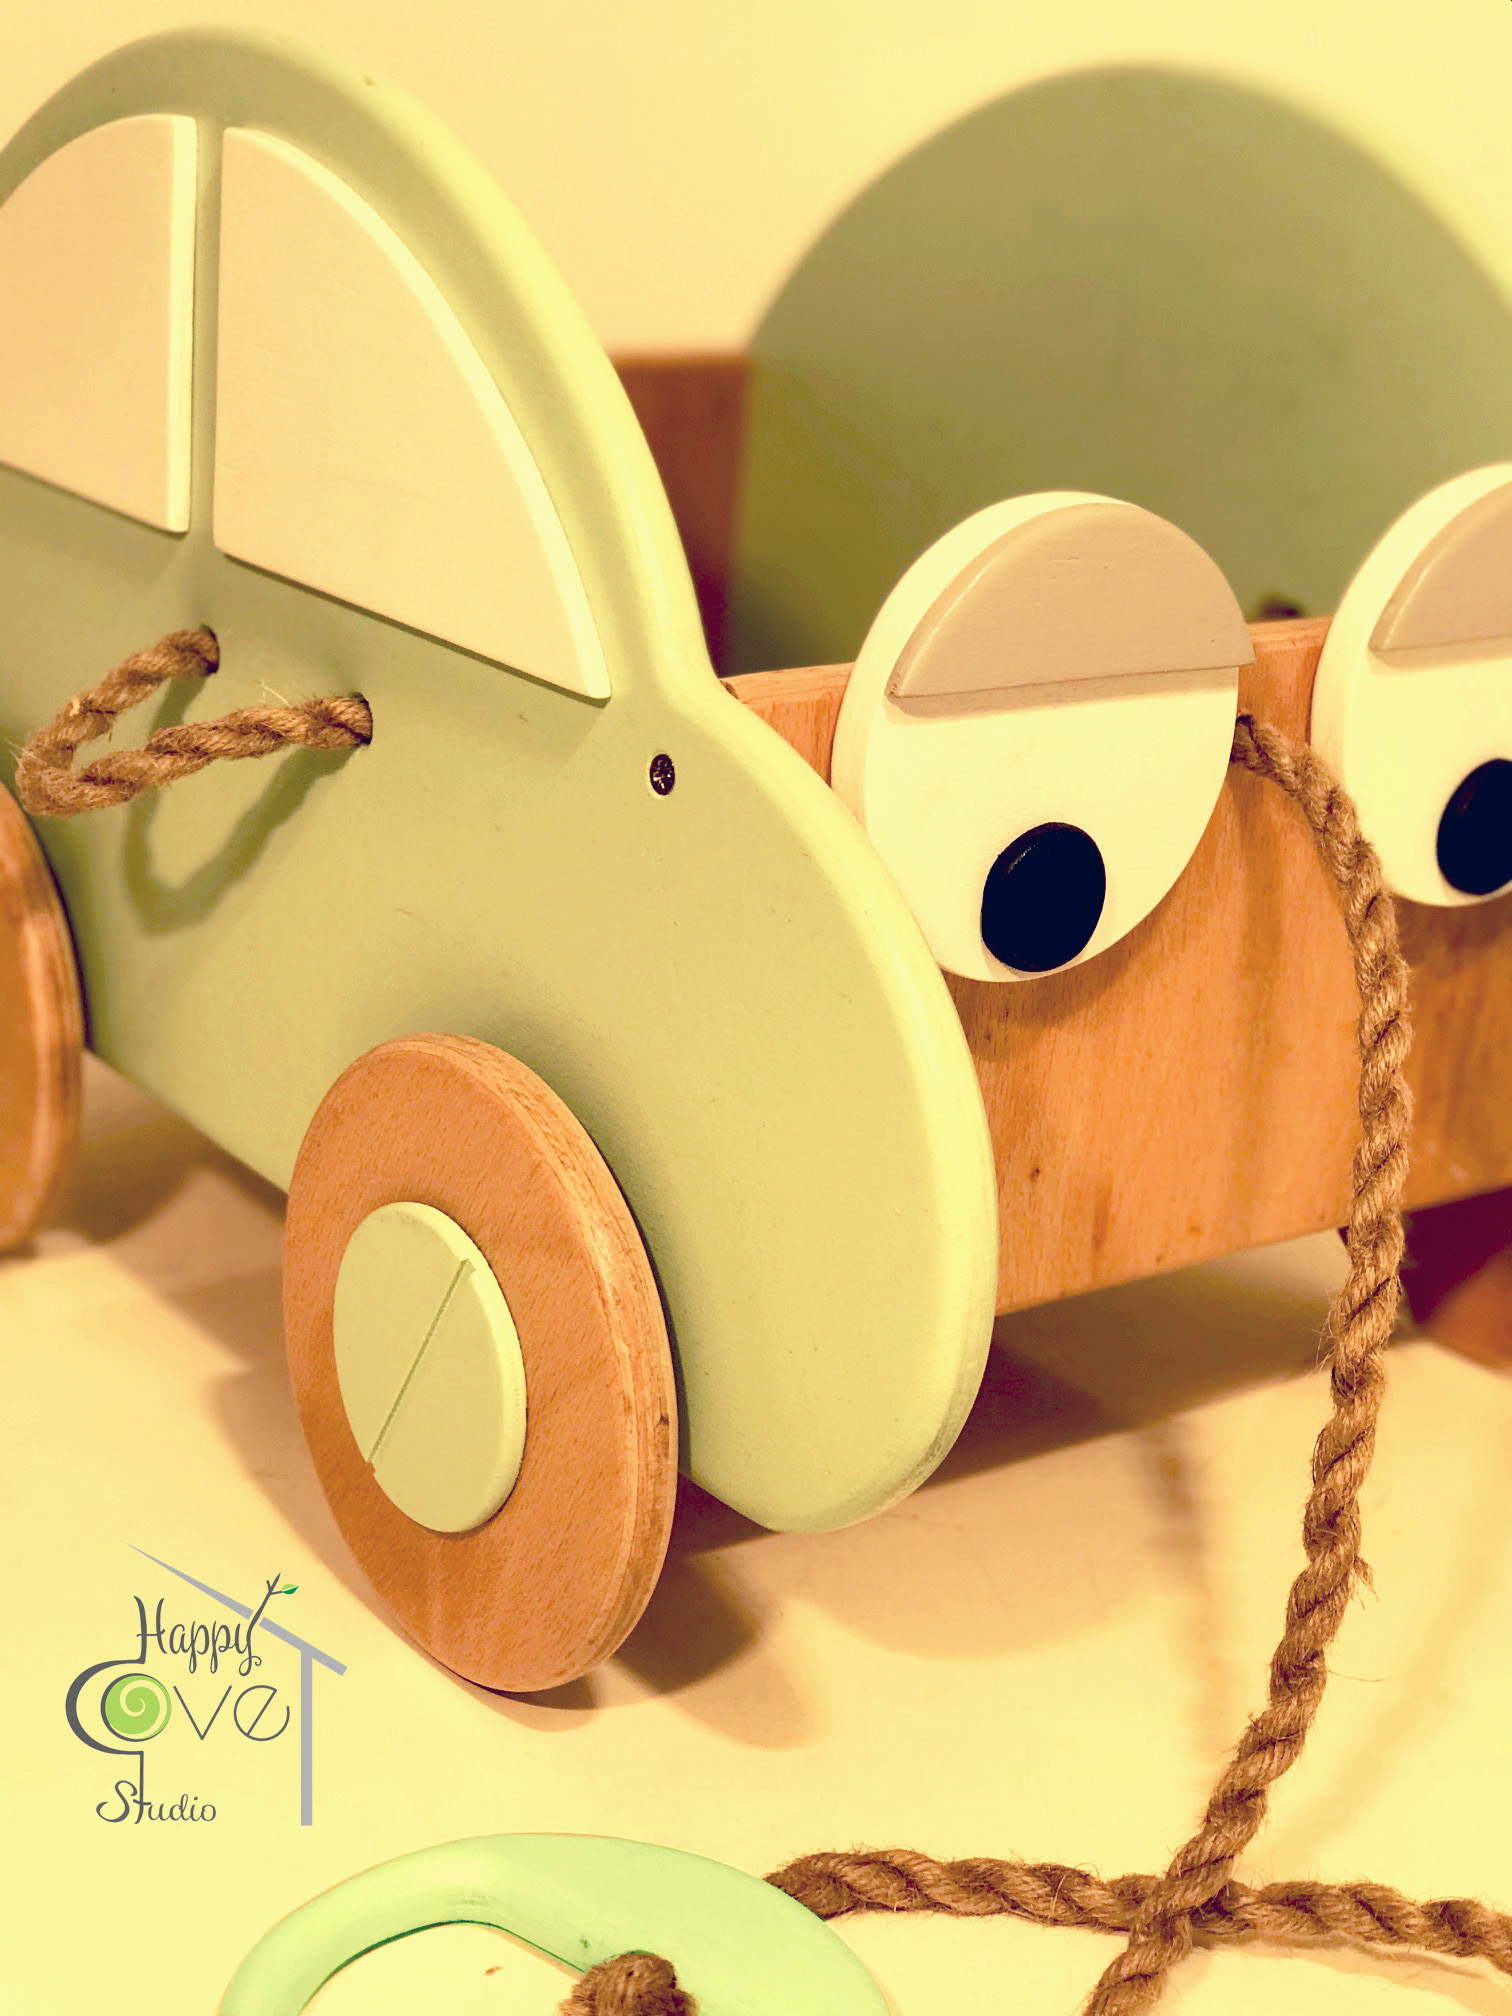 Çek Çek | Pull & Play Toy Car | Oyun